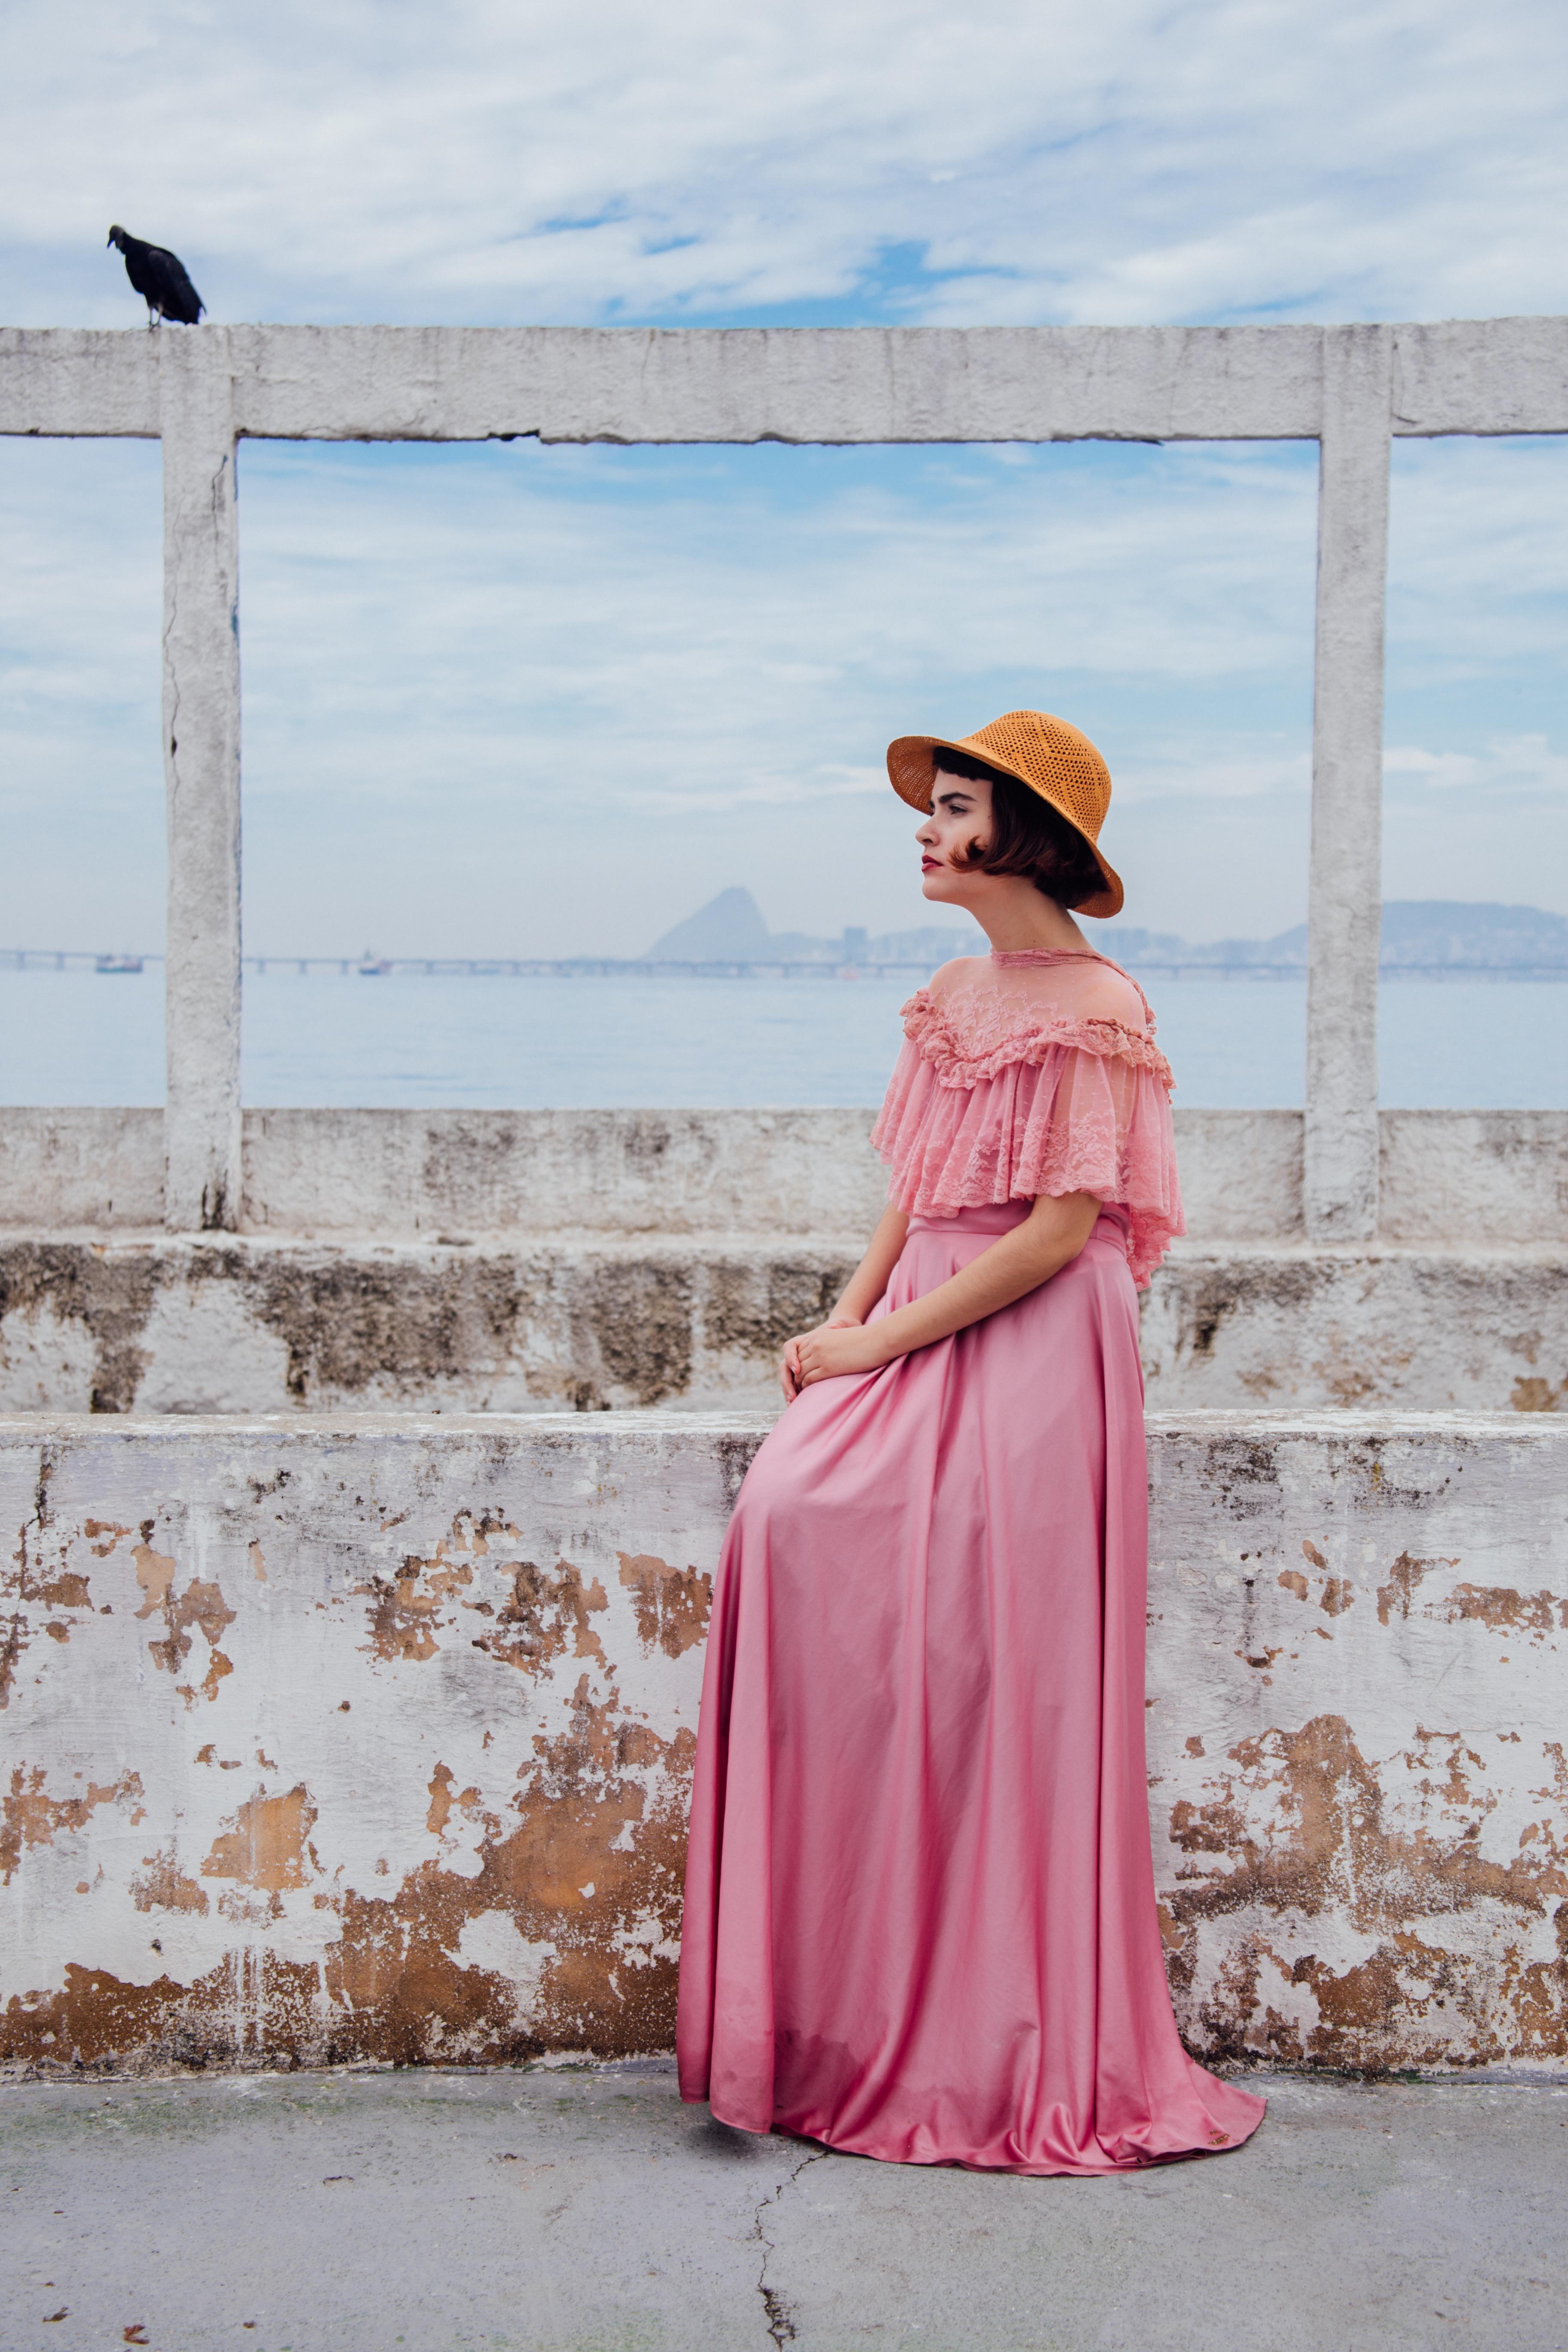 Fotos gratis : persona, mujer, vendimia, modelo, primavera, rojo ...